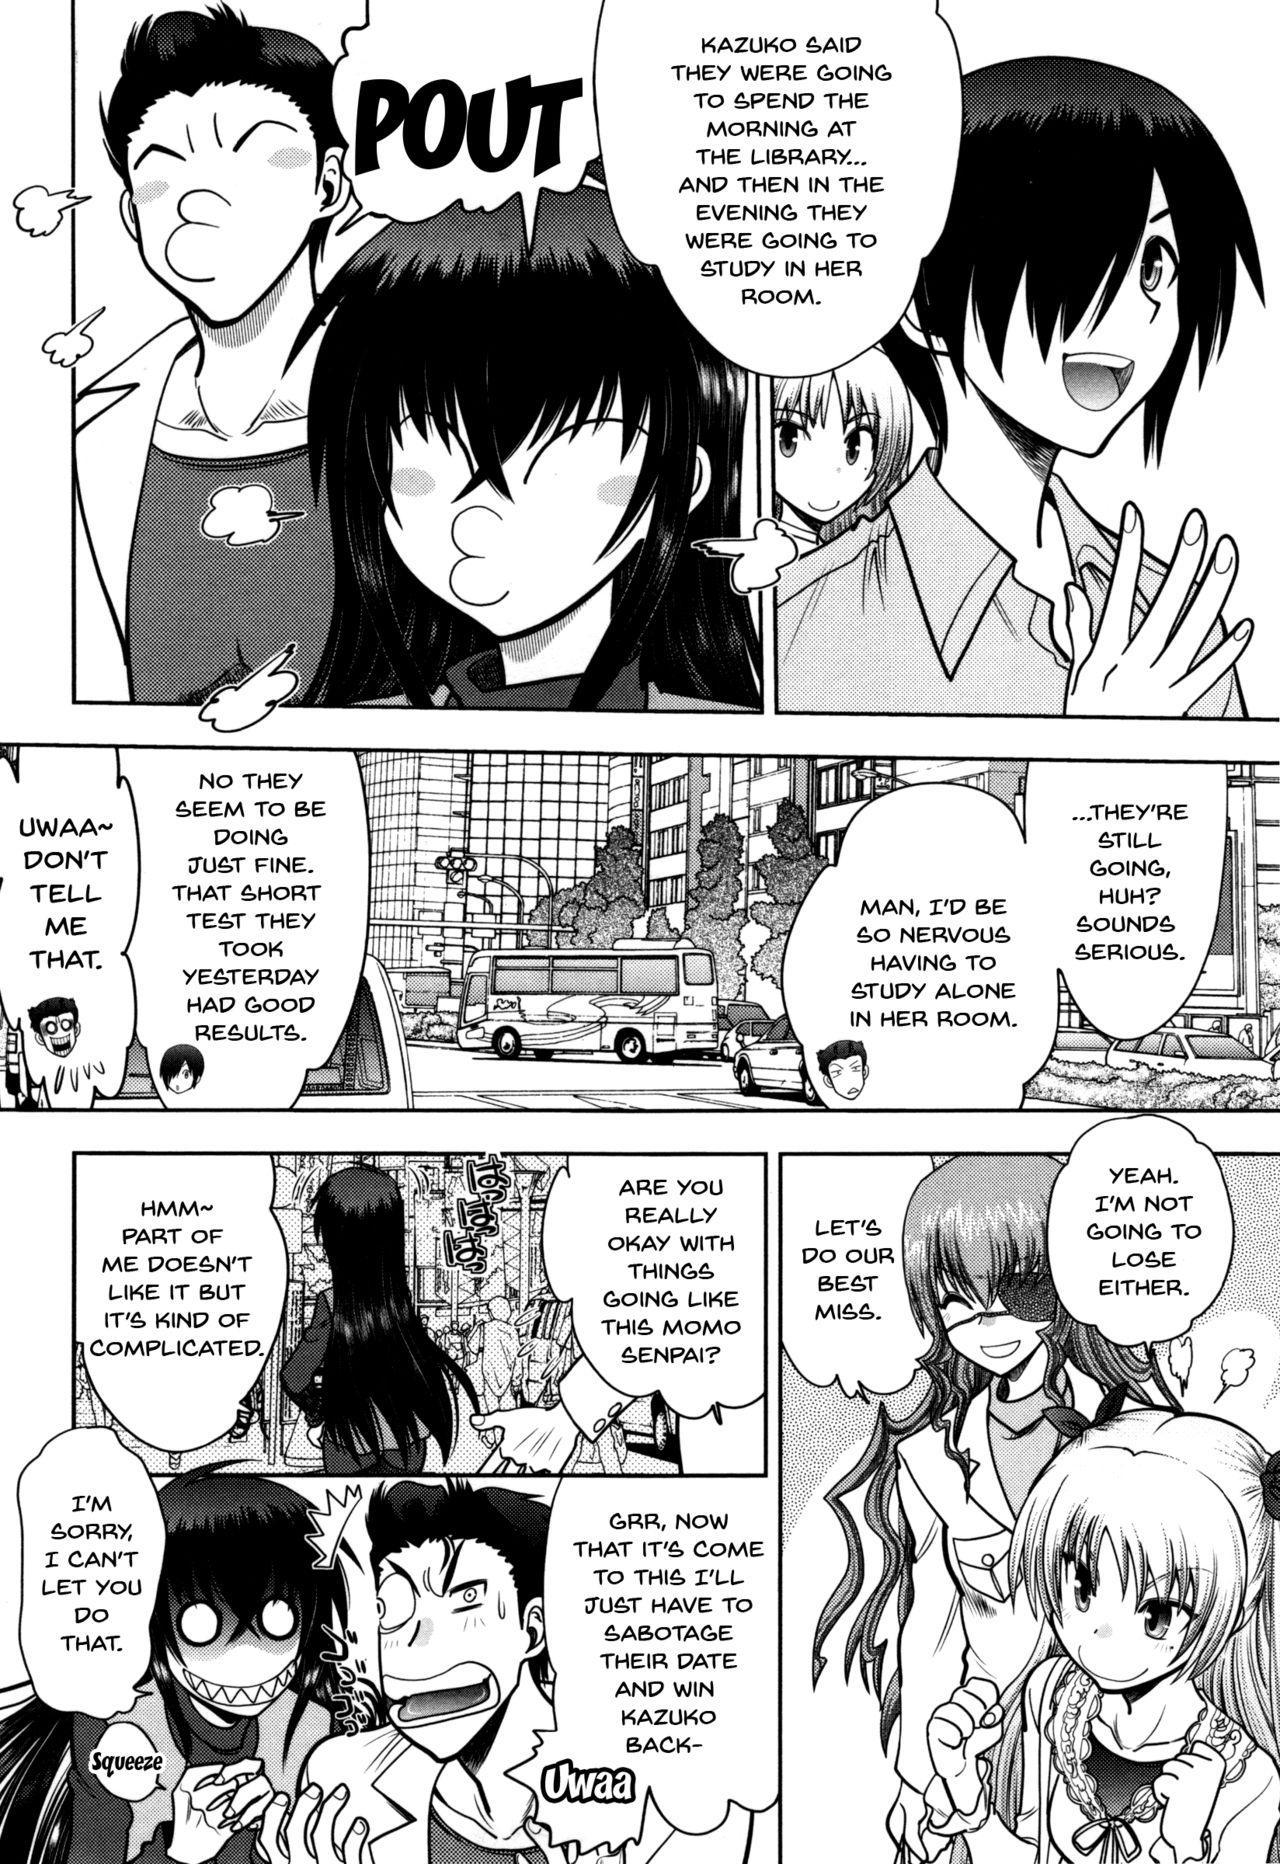 [Yagami Dai] Maji de Watashi ni Koi Shinasai! S Adult Edition ~Shodai Heroine Hen~ | Fall in Love With Me For Real! Ch.1-6 [English] {Doujins.com} 66